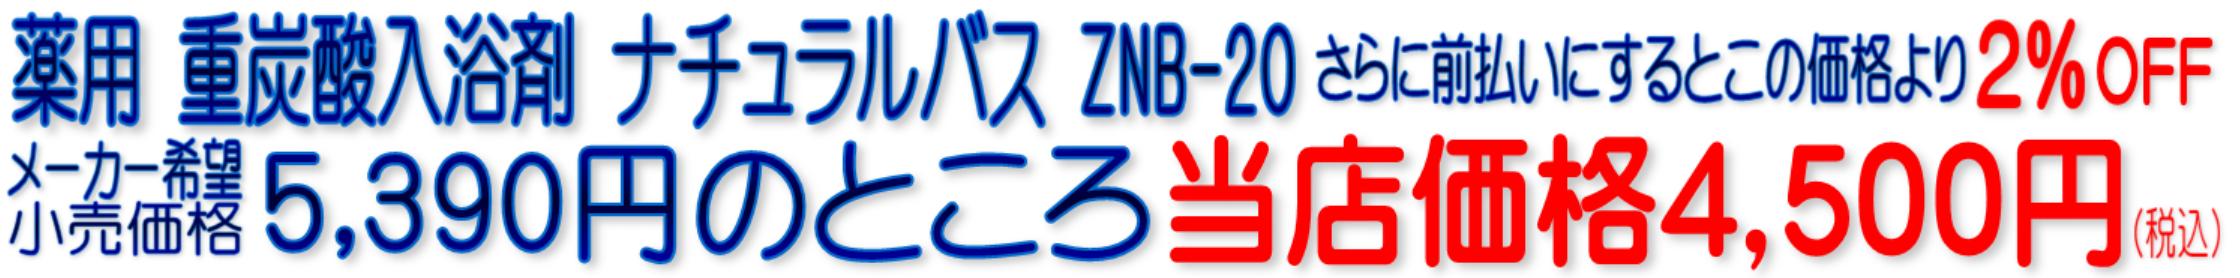 ZNB-20